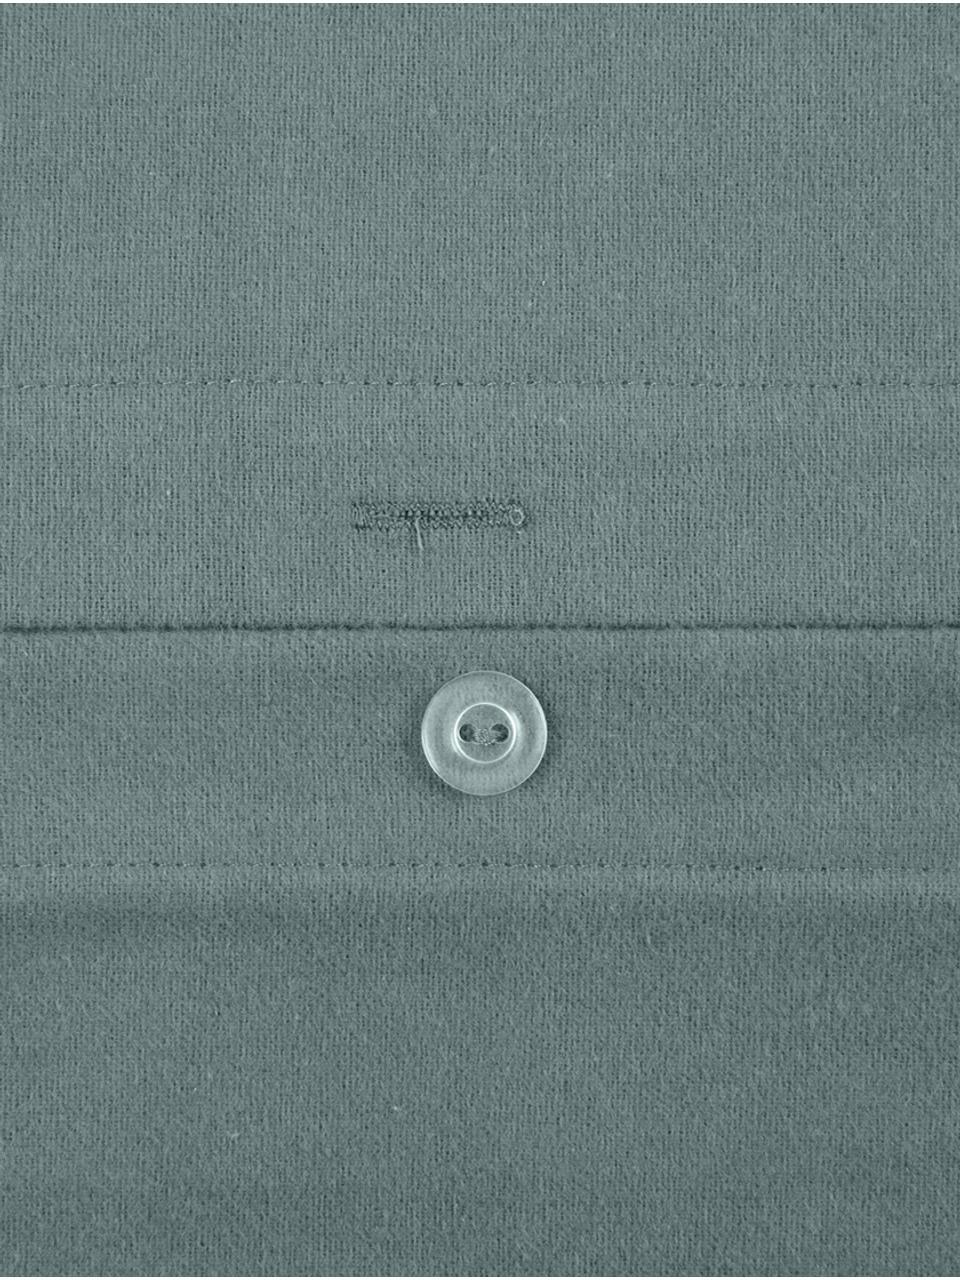 Flanell-Kissenbezüge Biba in Grün, 2 Stück, Webart: Flanell Flanell ist ein s, Grün, 40 x 80 cm